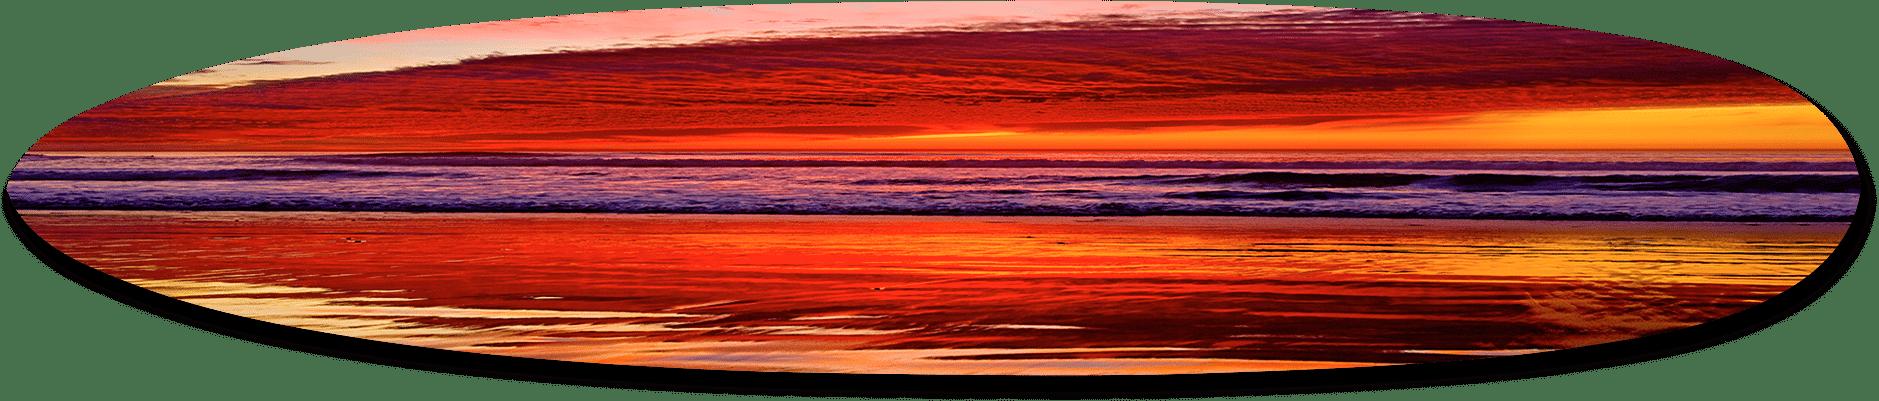 Seaside Sunset, California